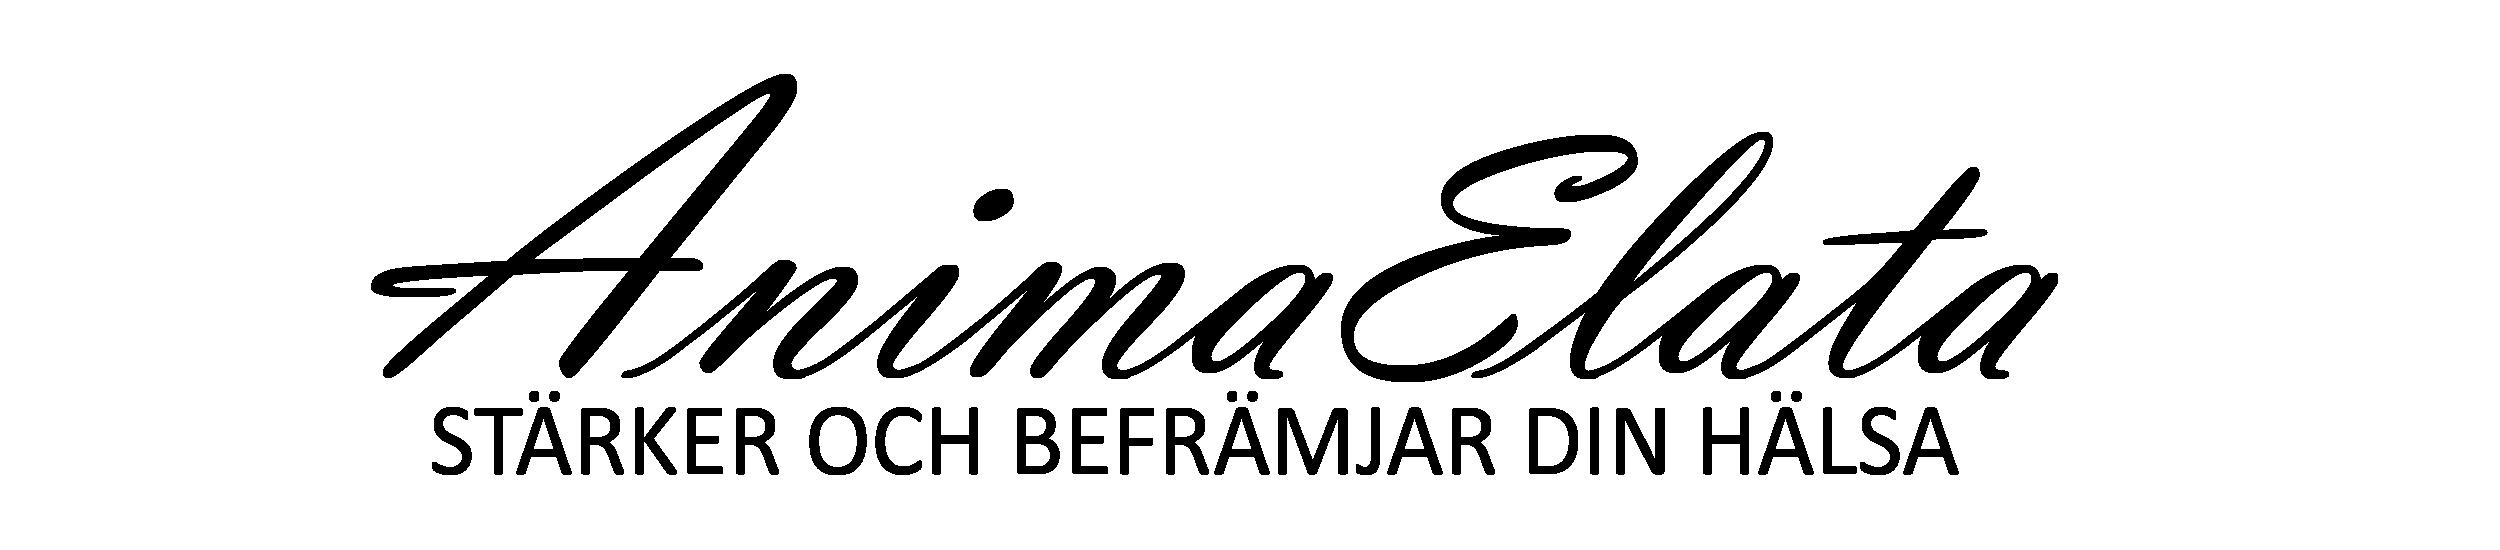 Mobil nya logo